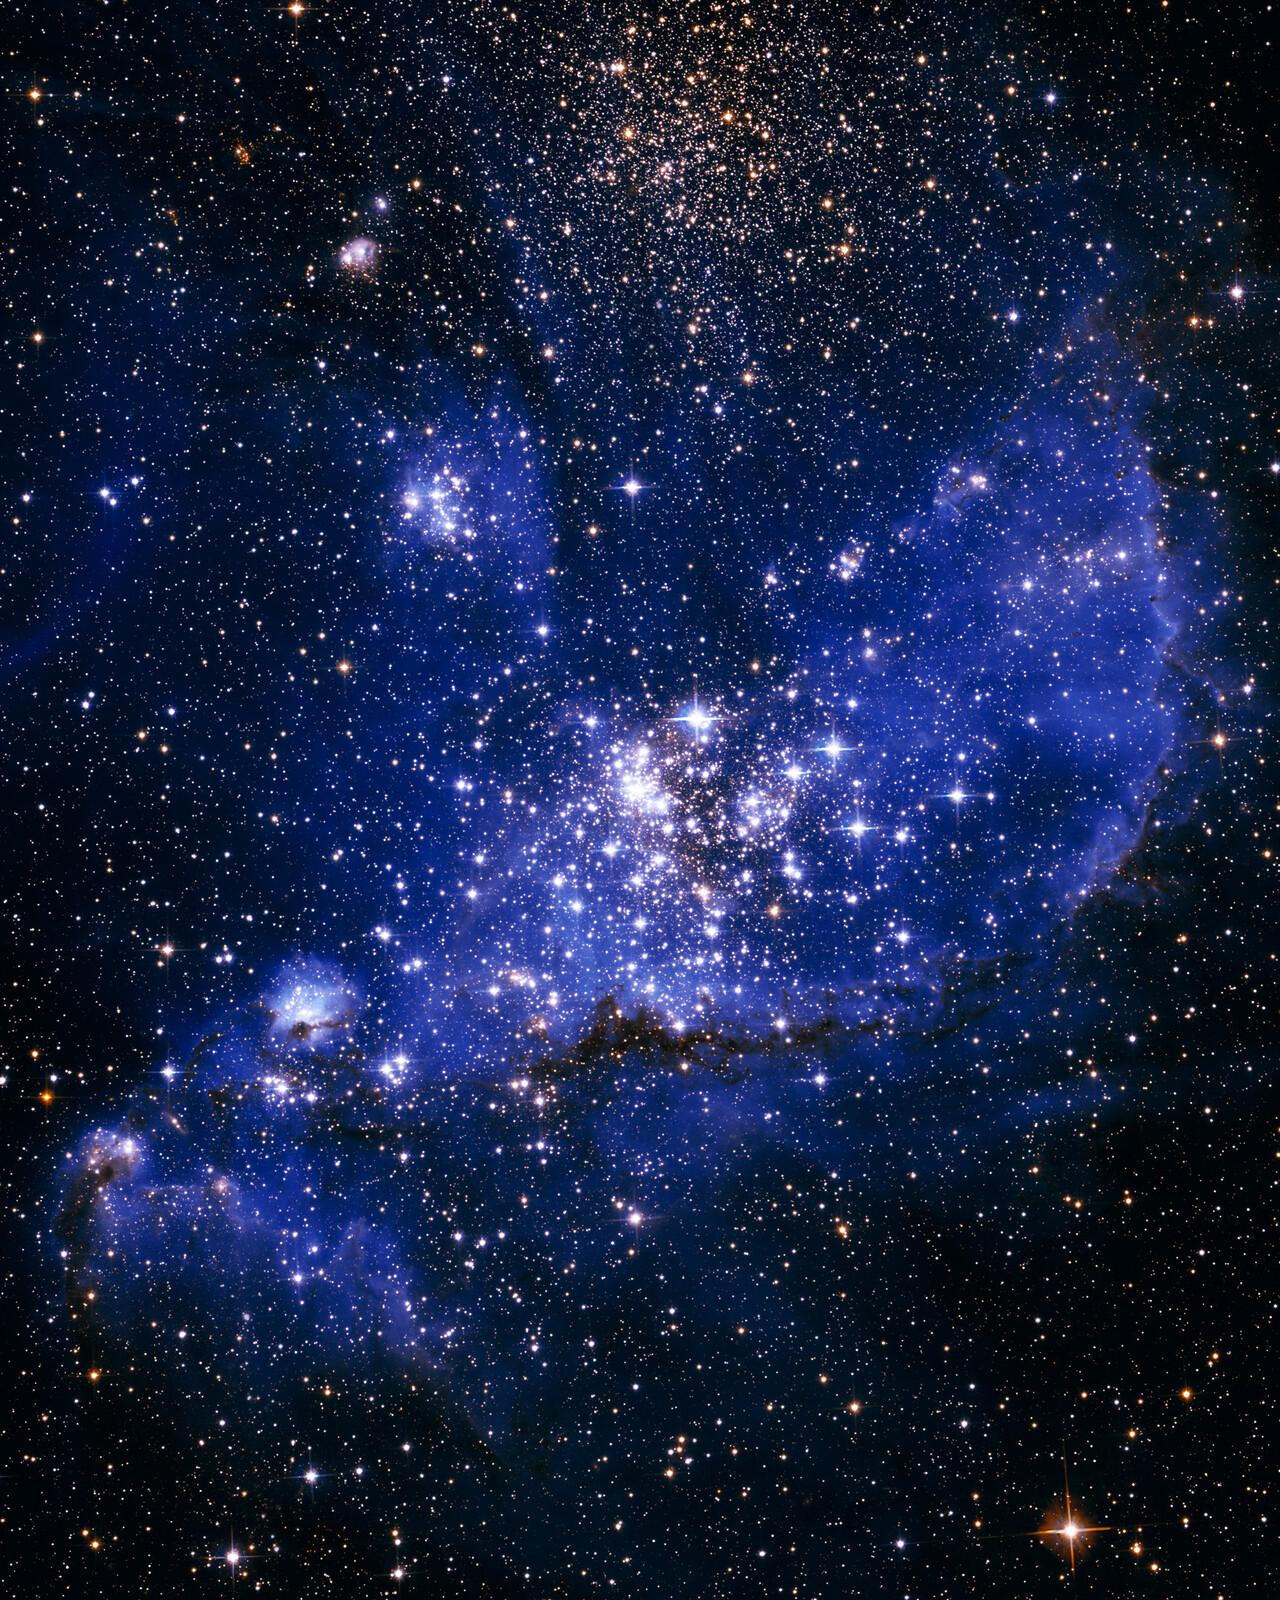 NGC 246 Nebula (NASA/ JPL - Caltech) - Hubble Telescope